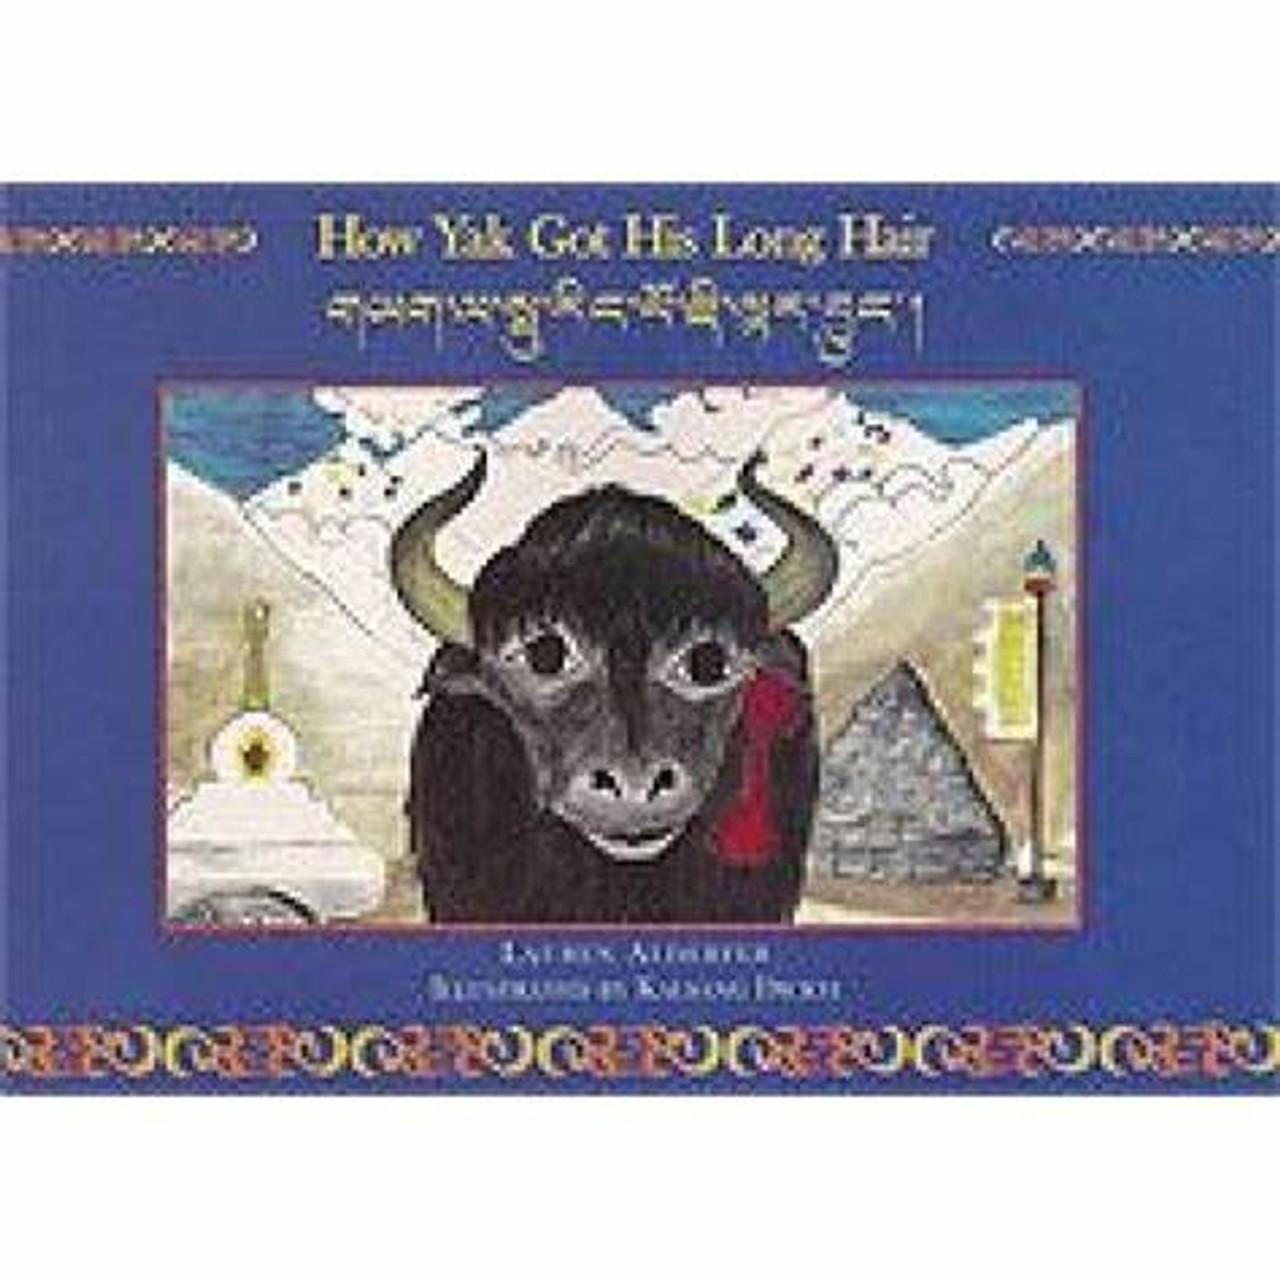 how the yak got his long hair